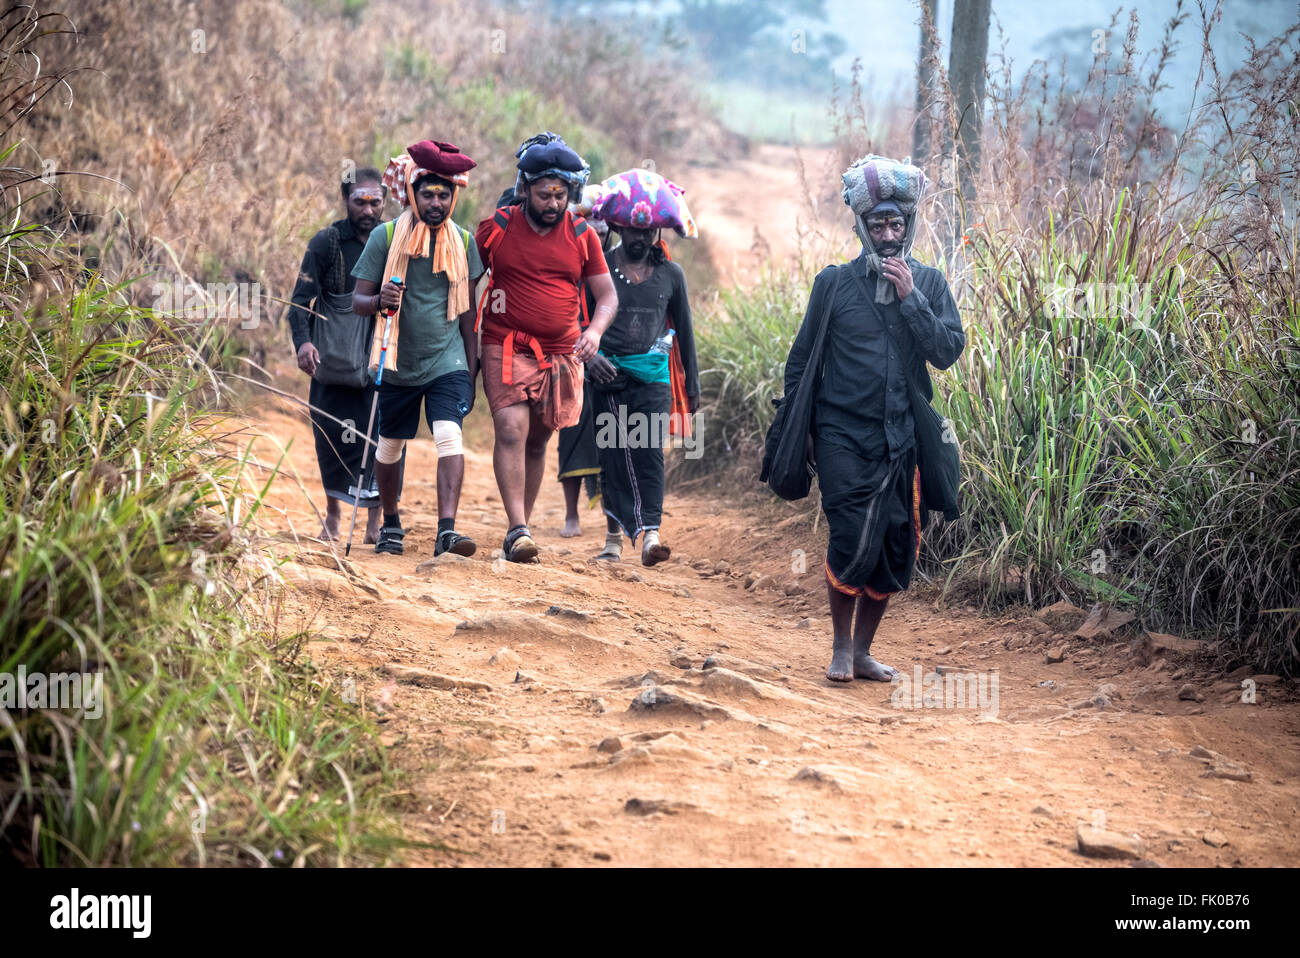 pilgrims in Periyar, Thekkady; Periyar; Kerala; India; Stock Photo